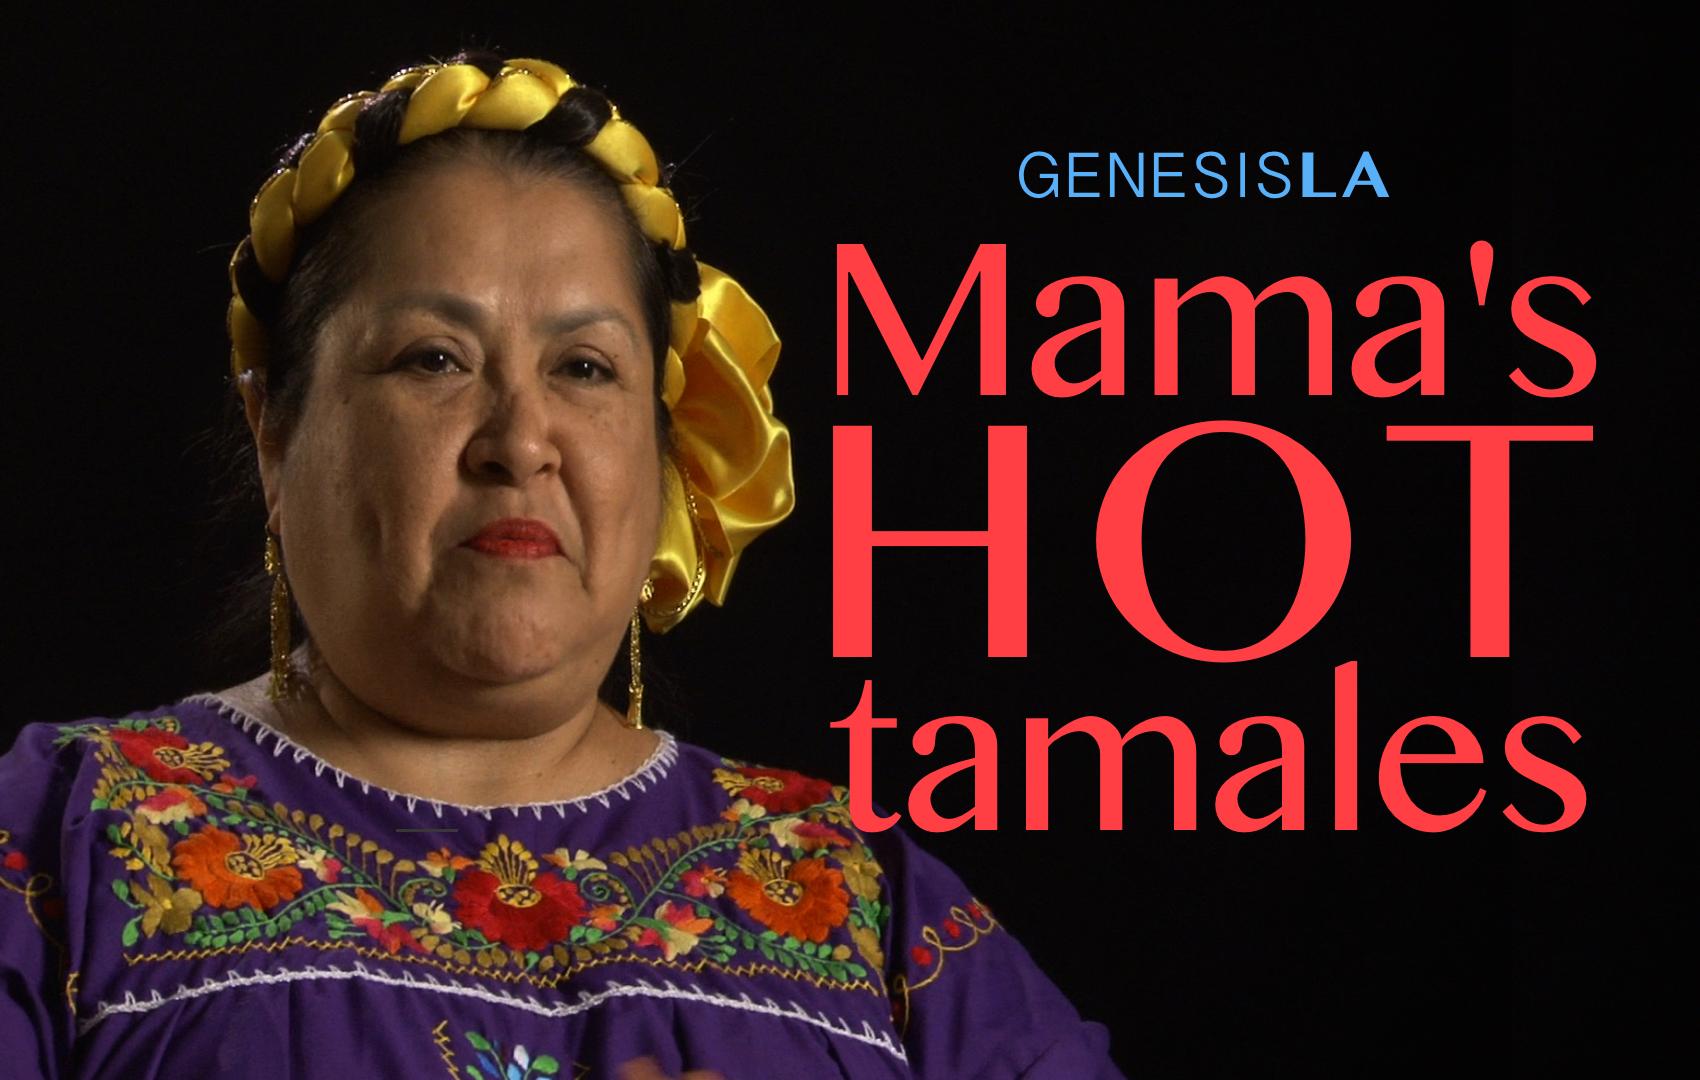 Mama's_Hot_Tamales_4x3